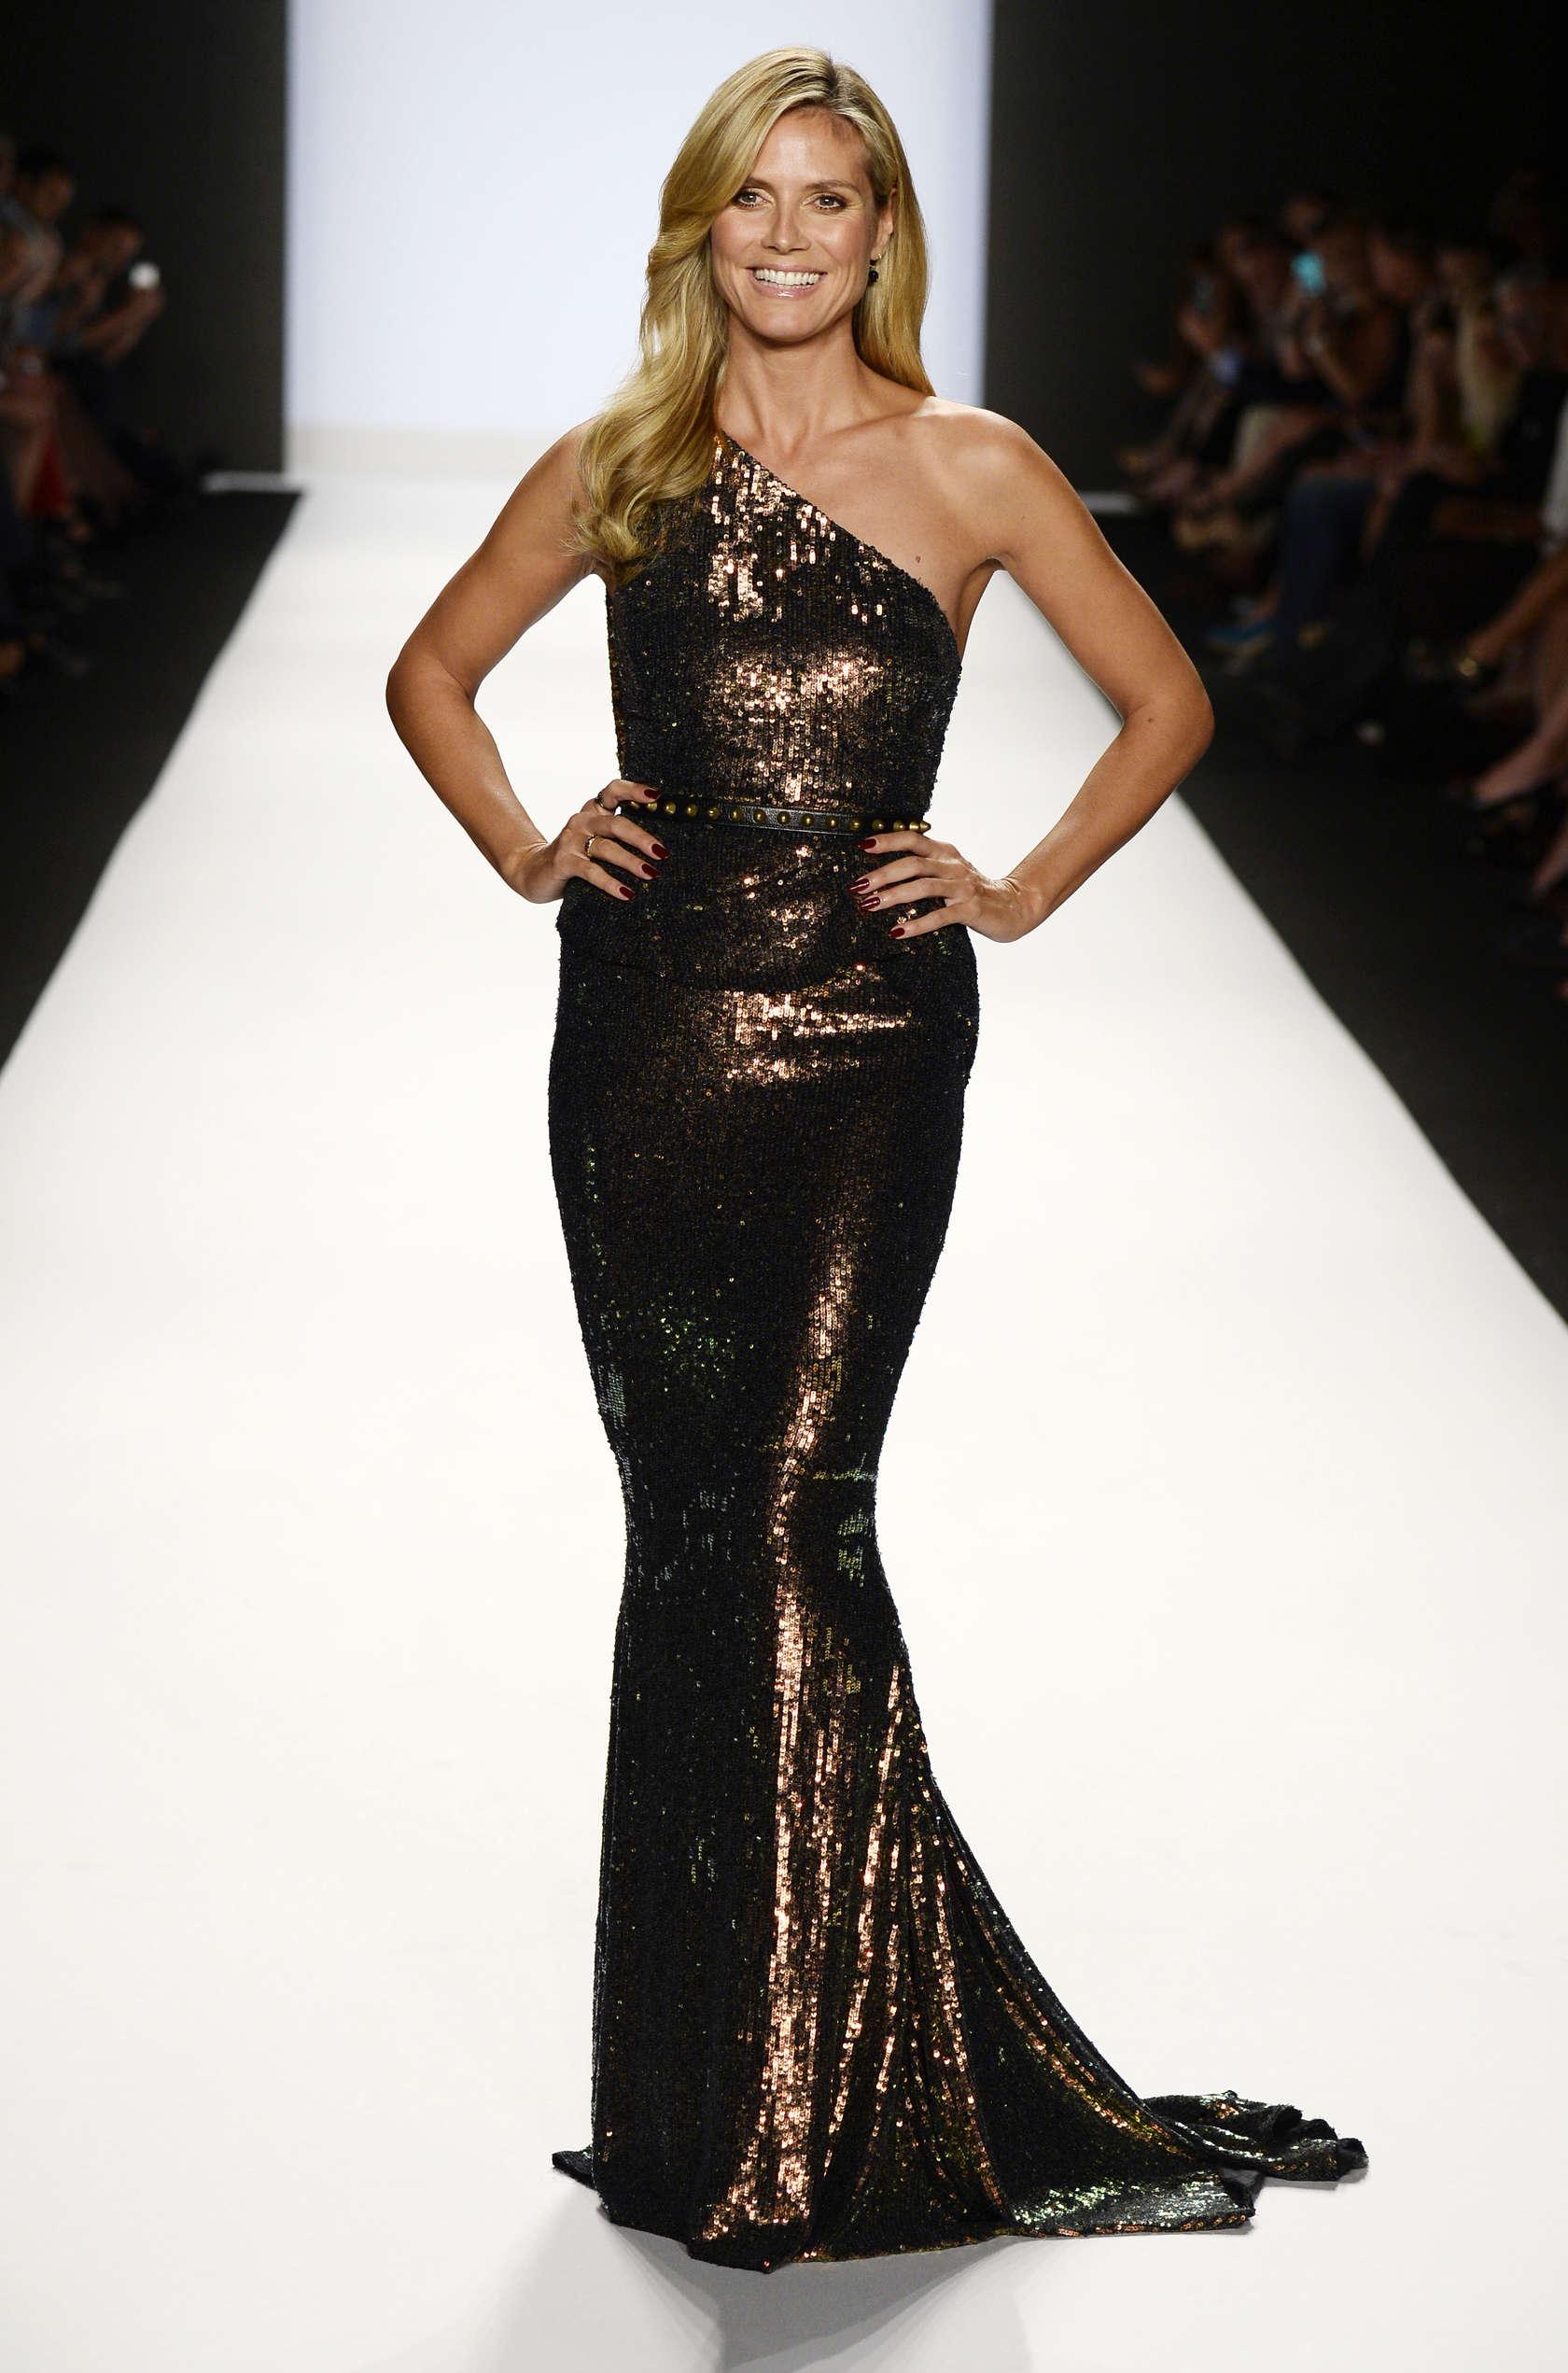 Heidi klum project runway spring 2014 fashion show 06 for Fashion runway shows videos